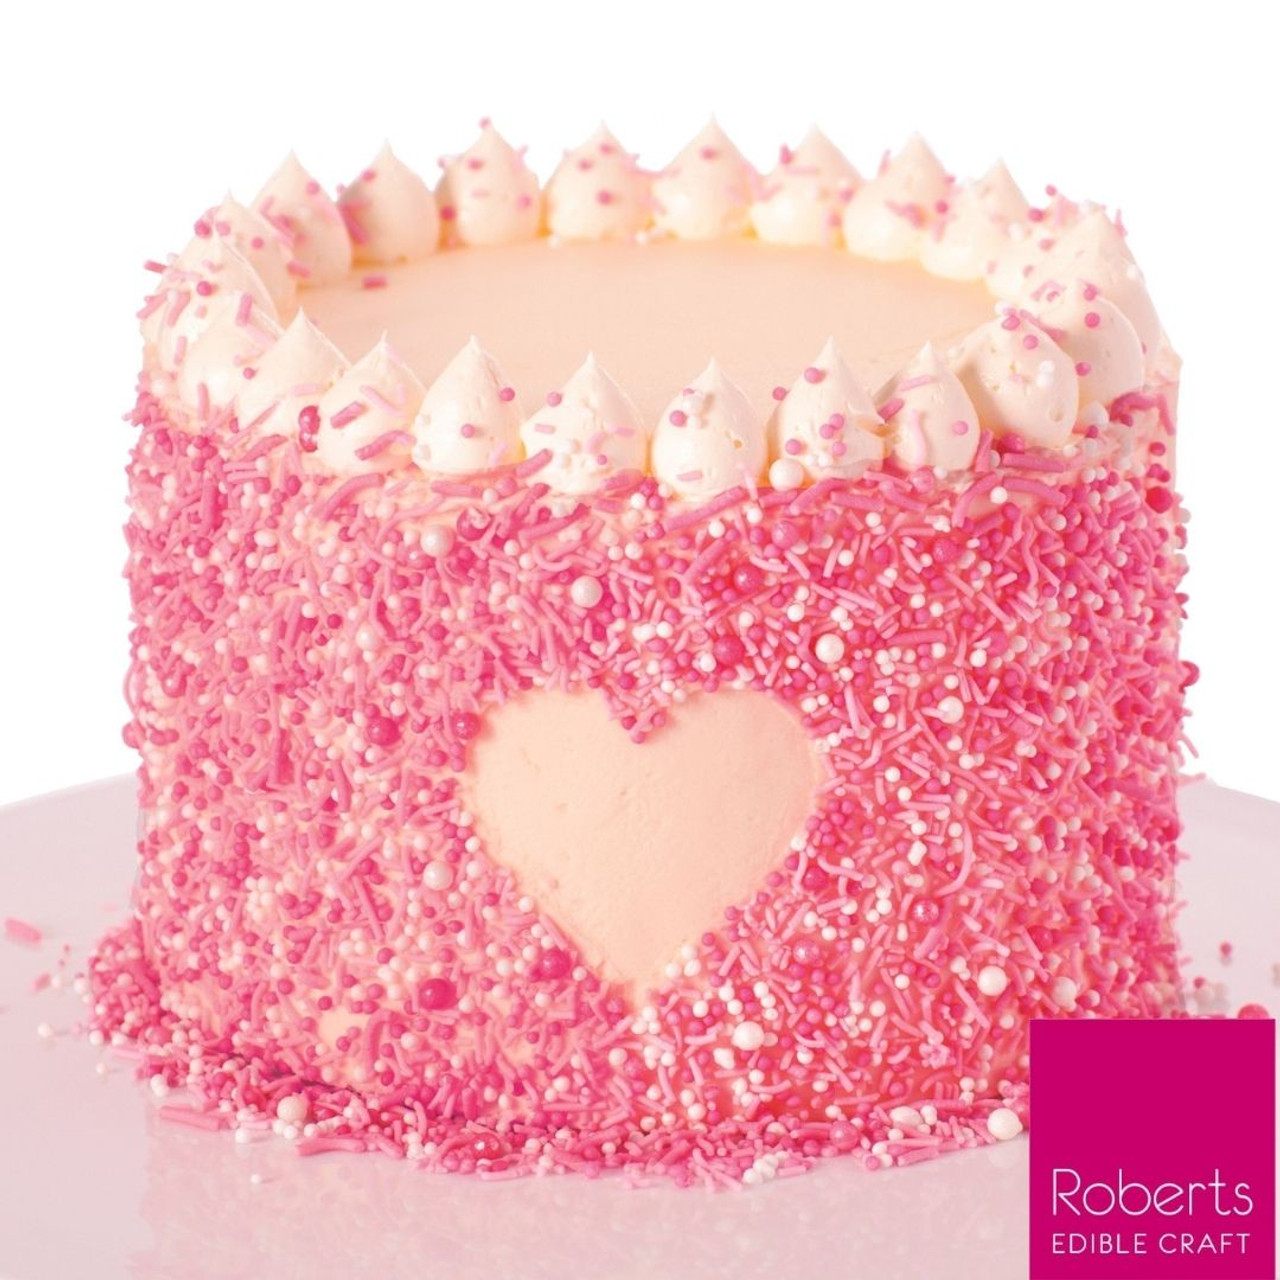 Vanilla Party Cake Kit - Sprinkles Included